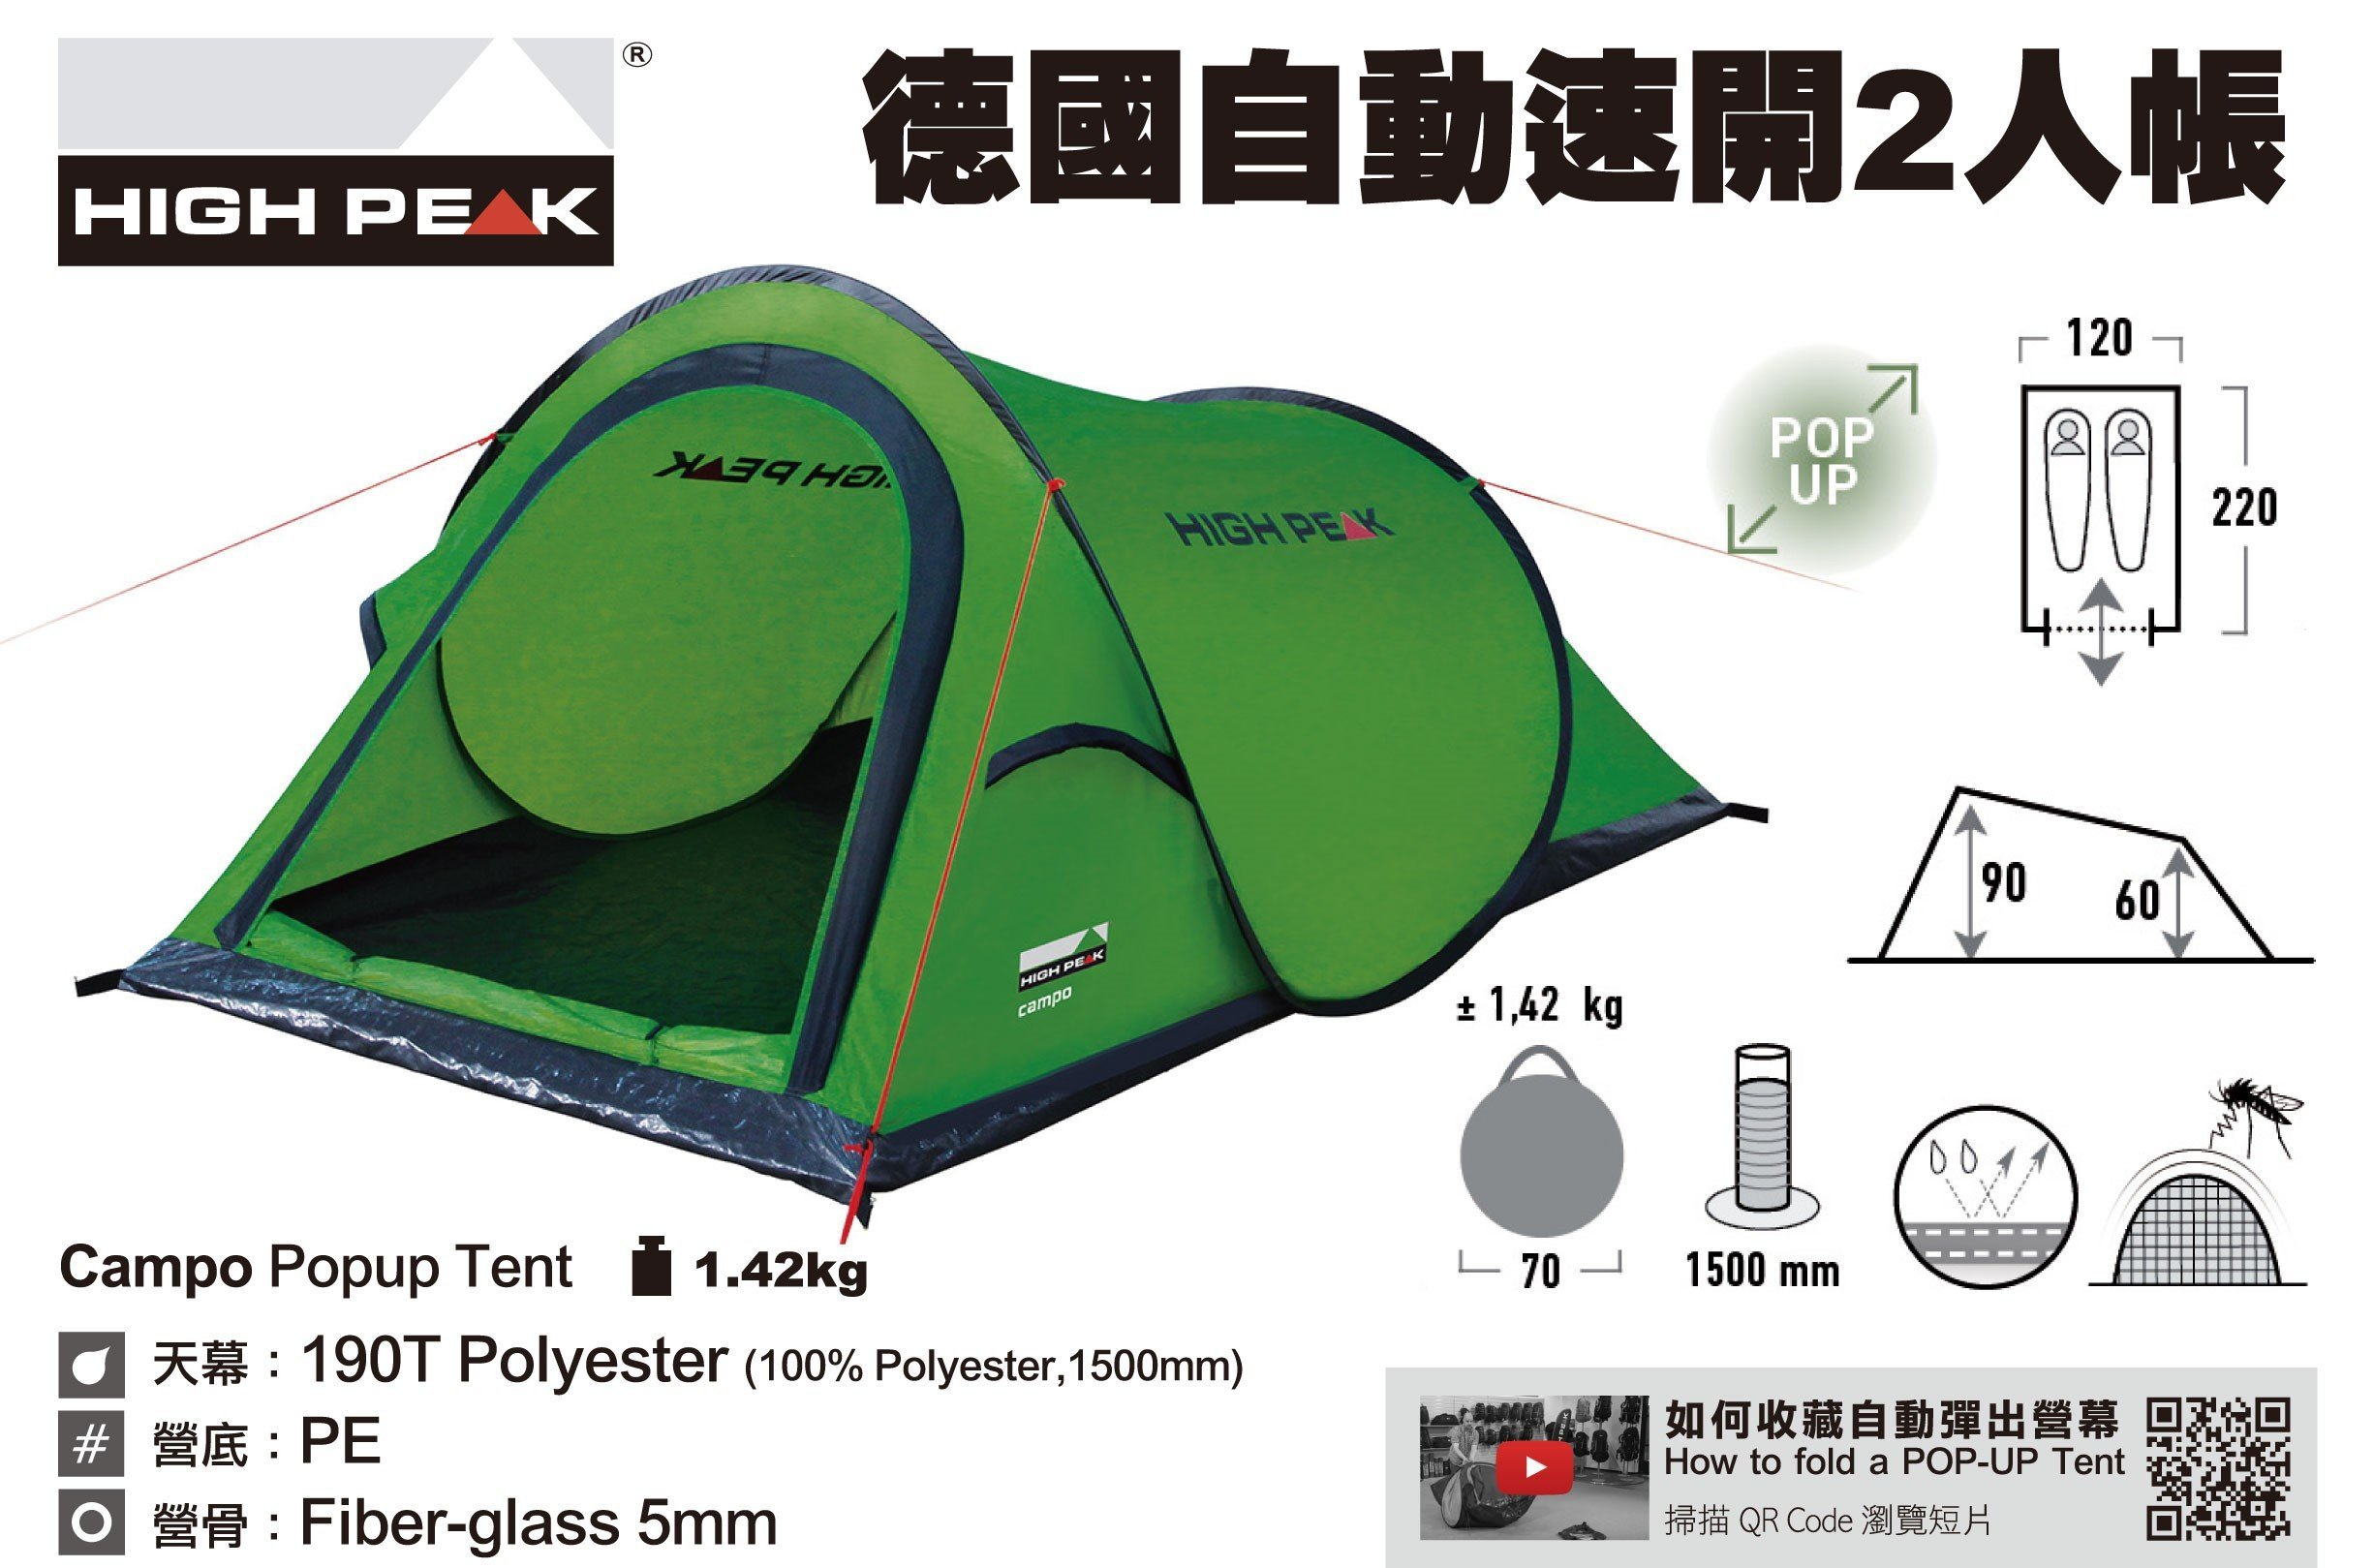 d10d999ae6d HIGH PEAK   Germany Campo Green/Phantom   HKTVmall Online Shopping